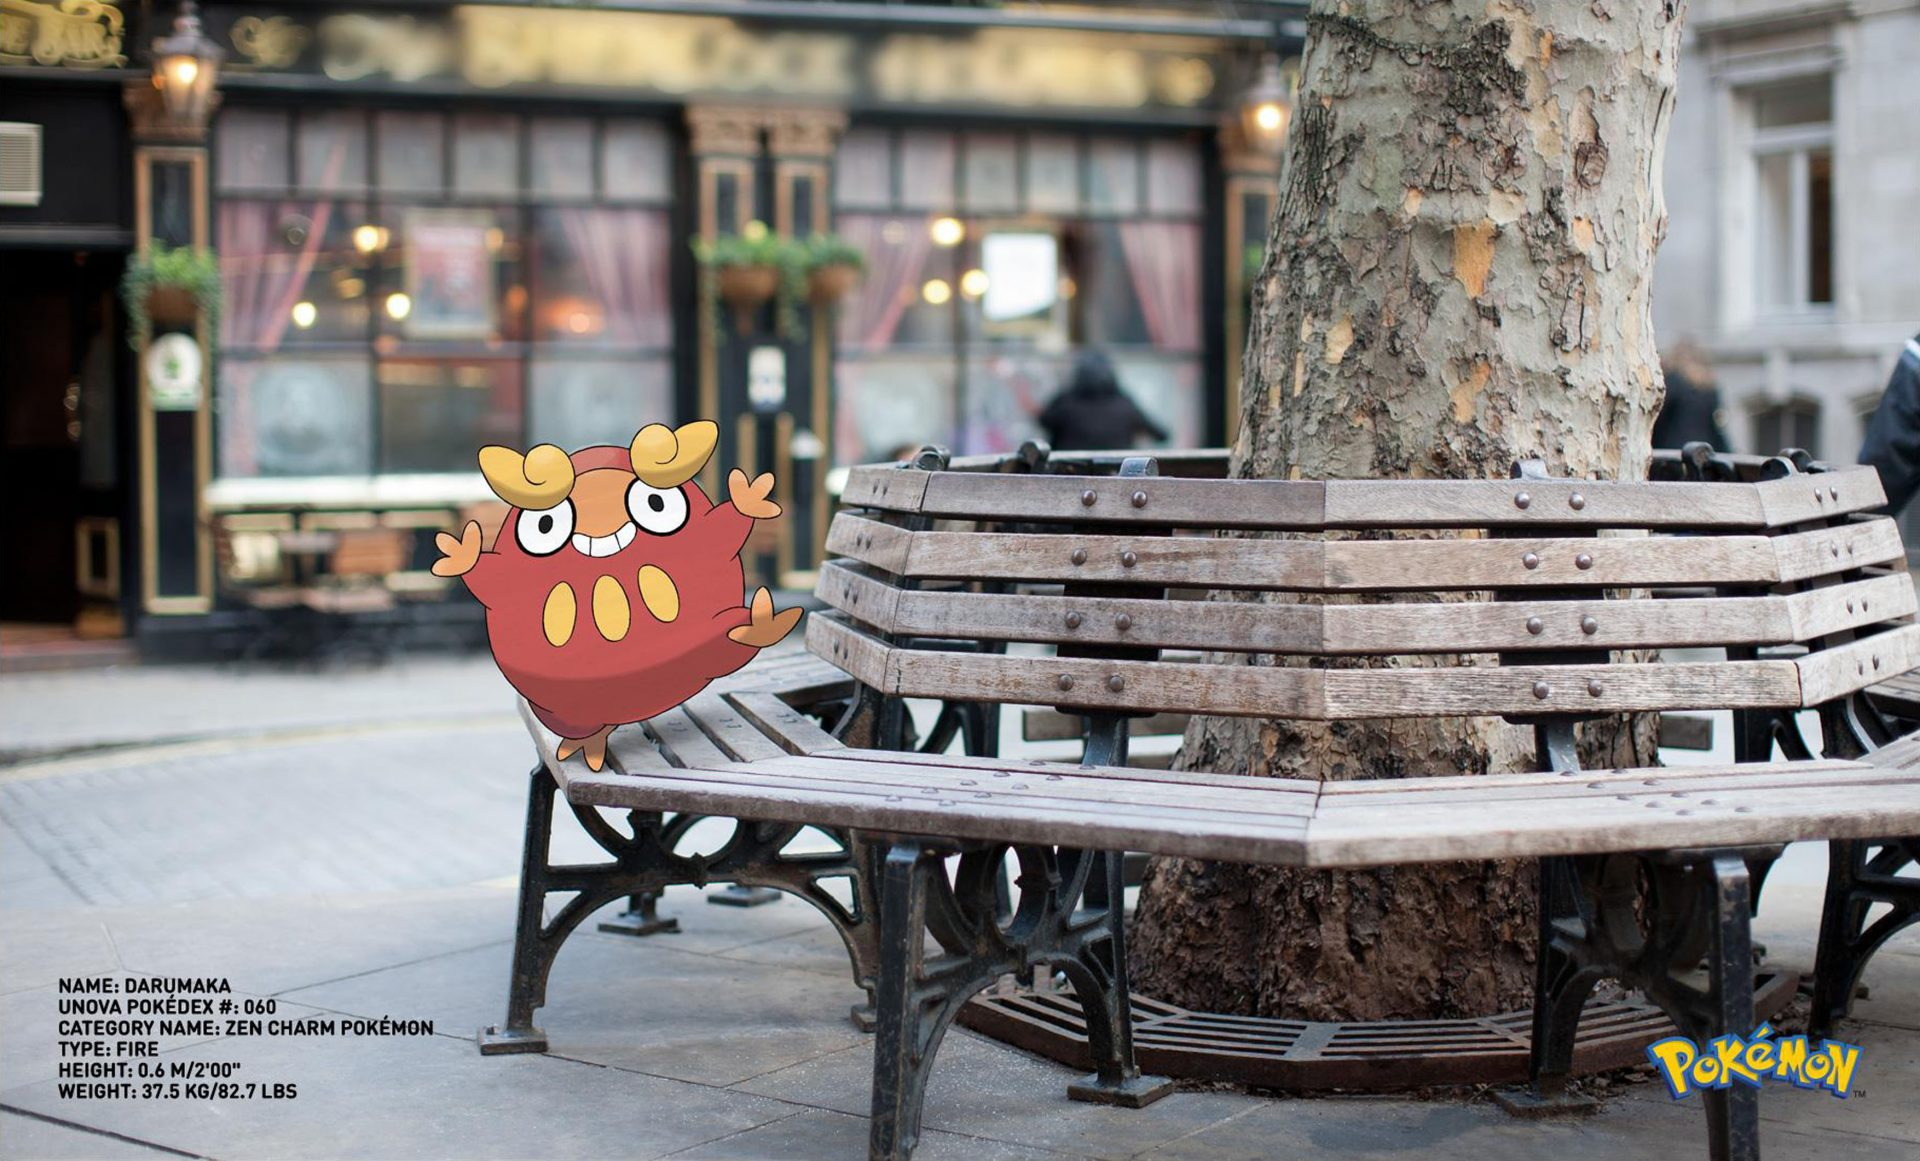 Pokemon Go Darumaka Zen Charm Pokemon on bench Dentsu London Rome Italy – Shaw and Shaw Photography photographer